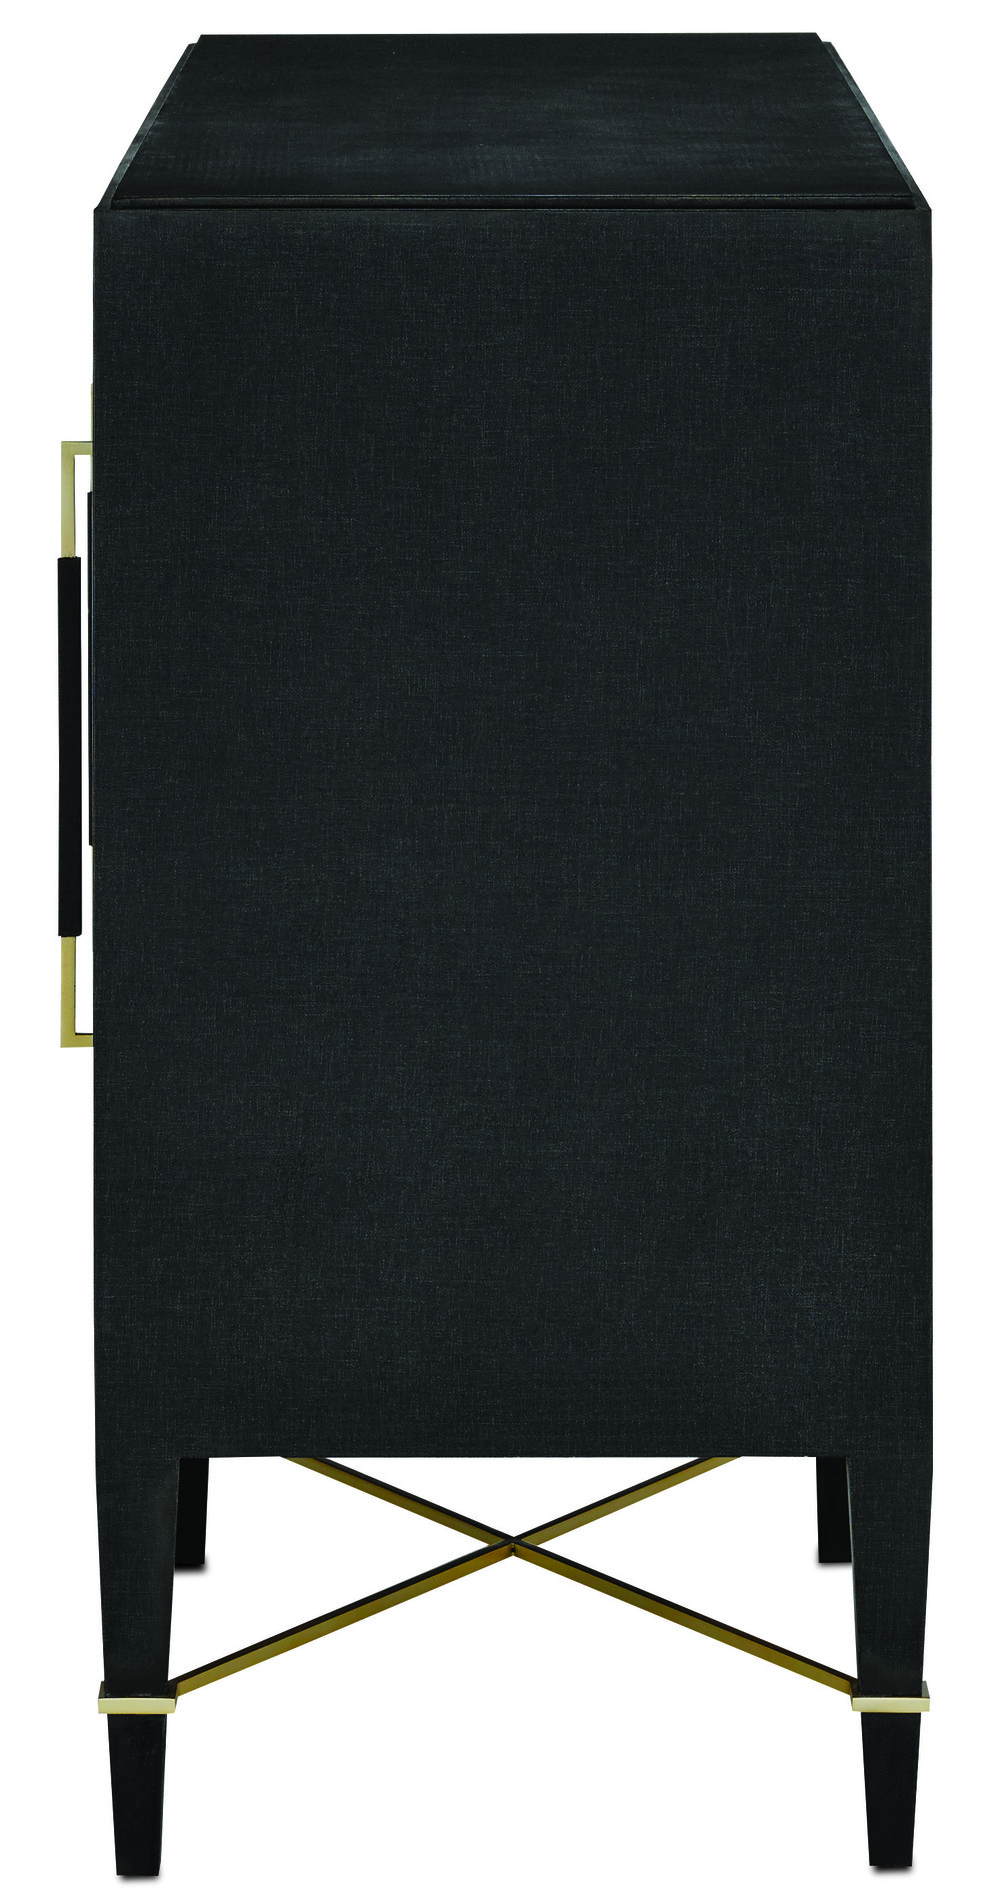 Currey & Company - Verona Black Sideboard